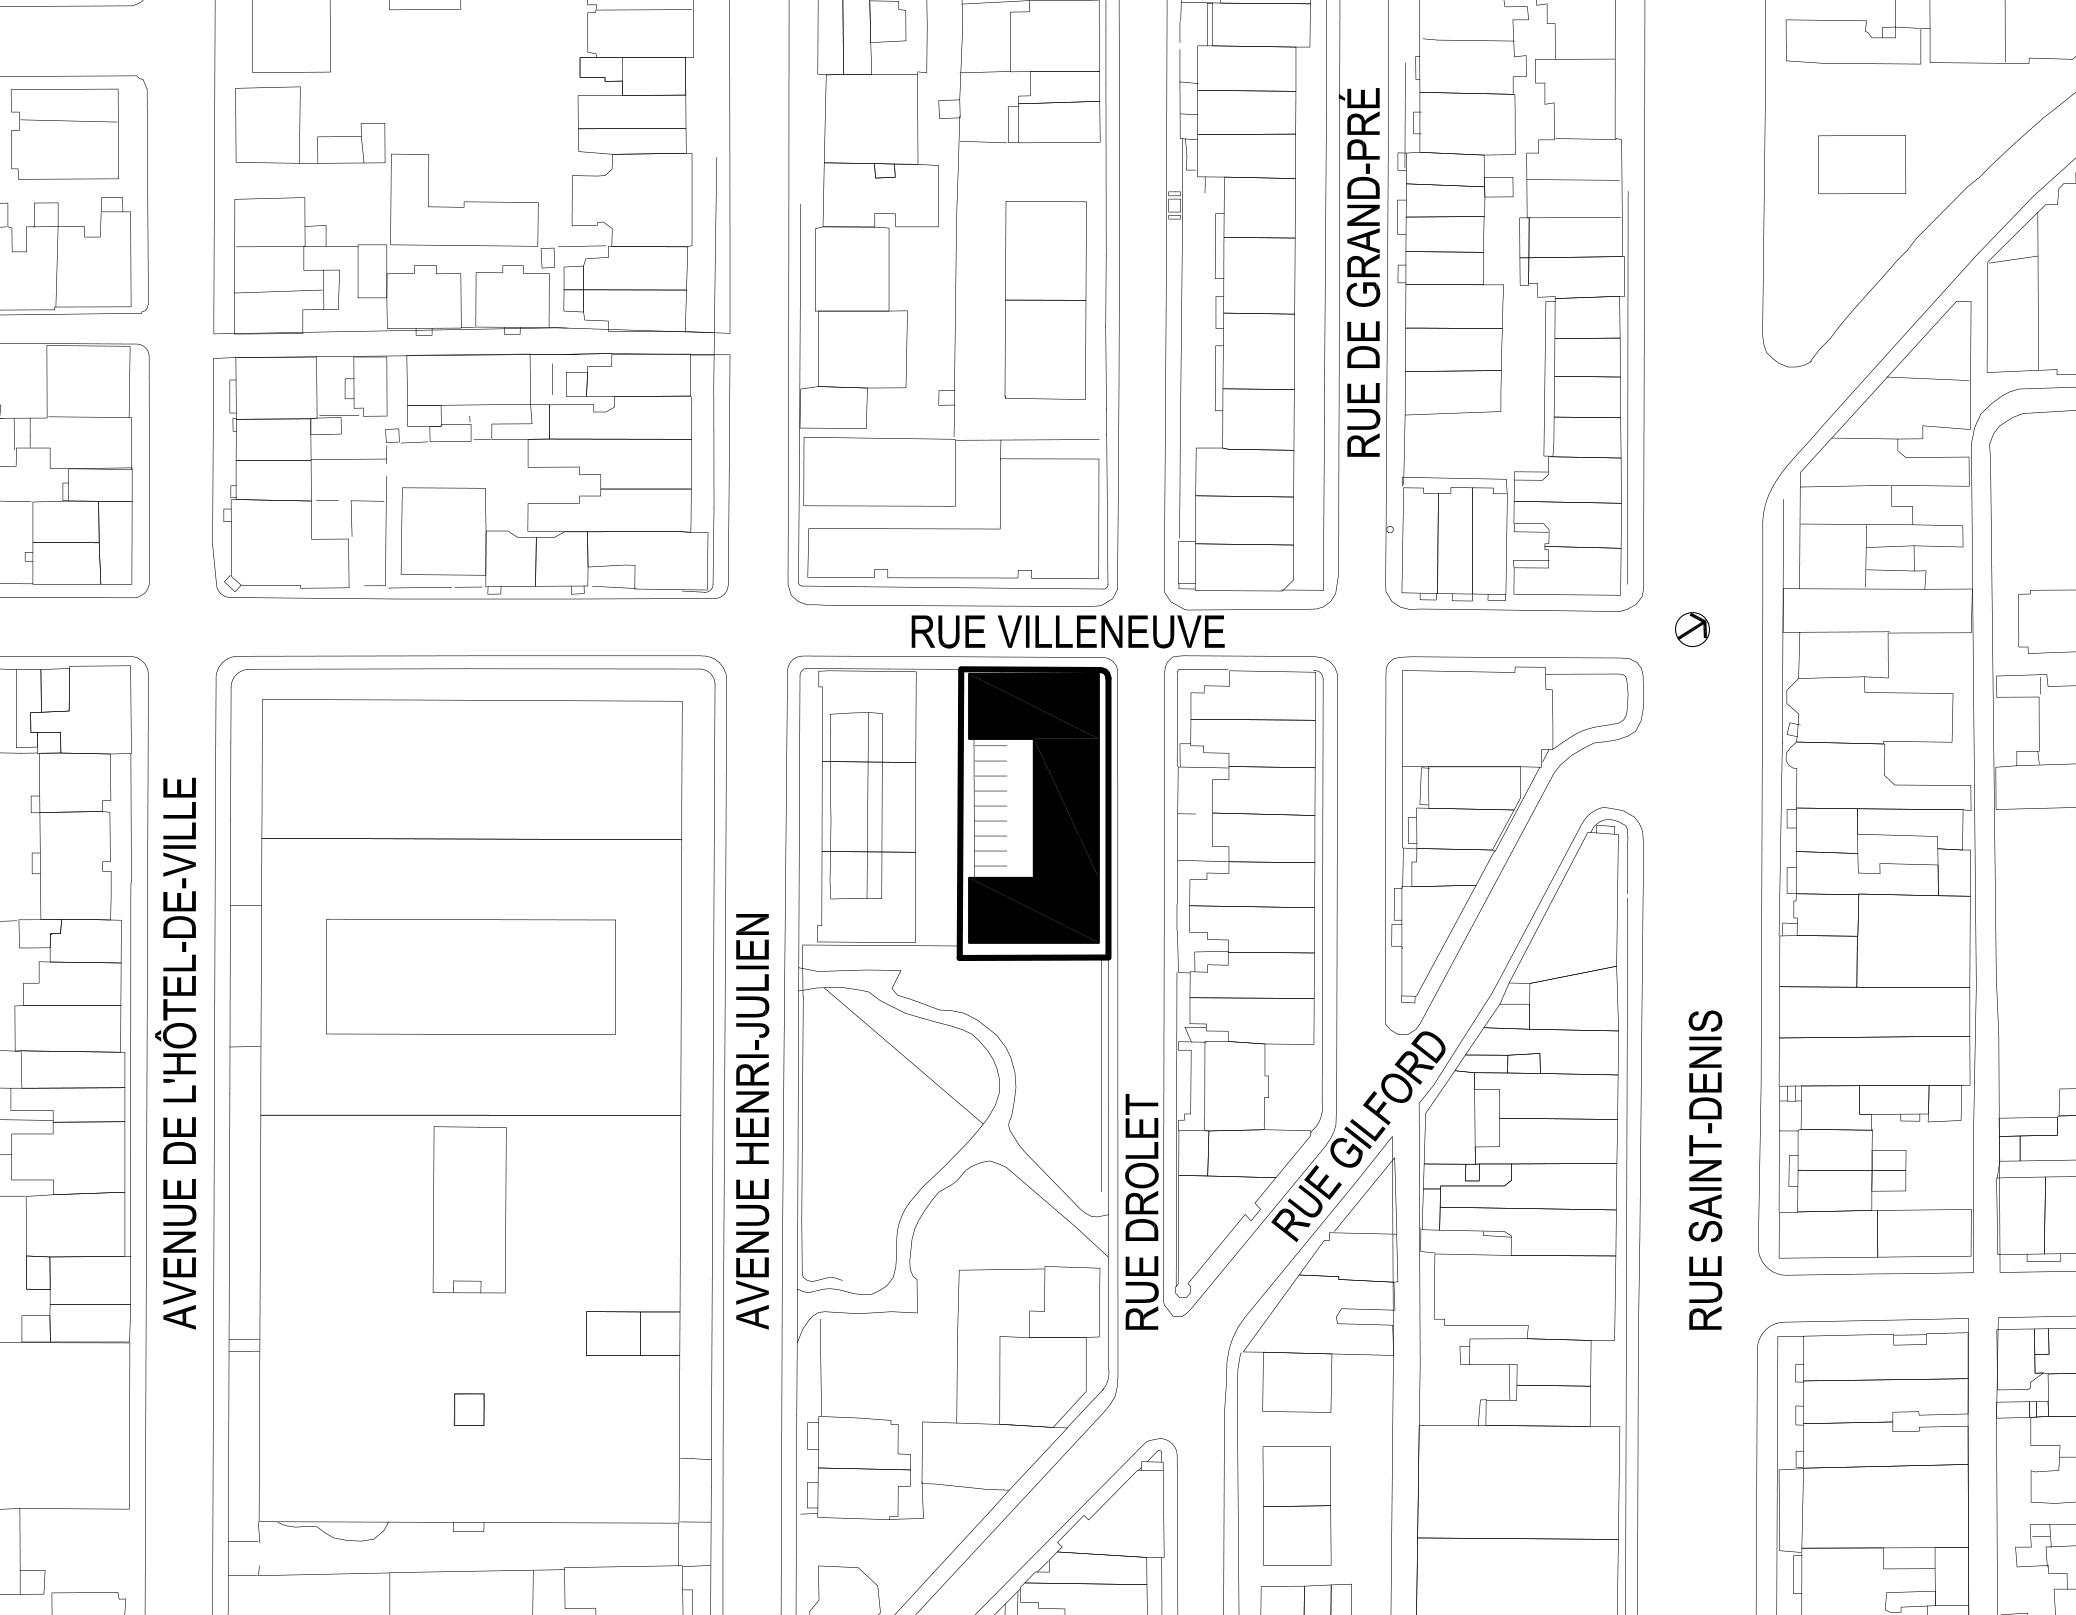 DRVI plan localisation_03.jpg